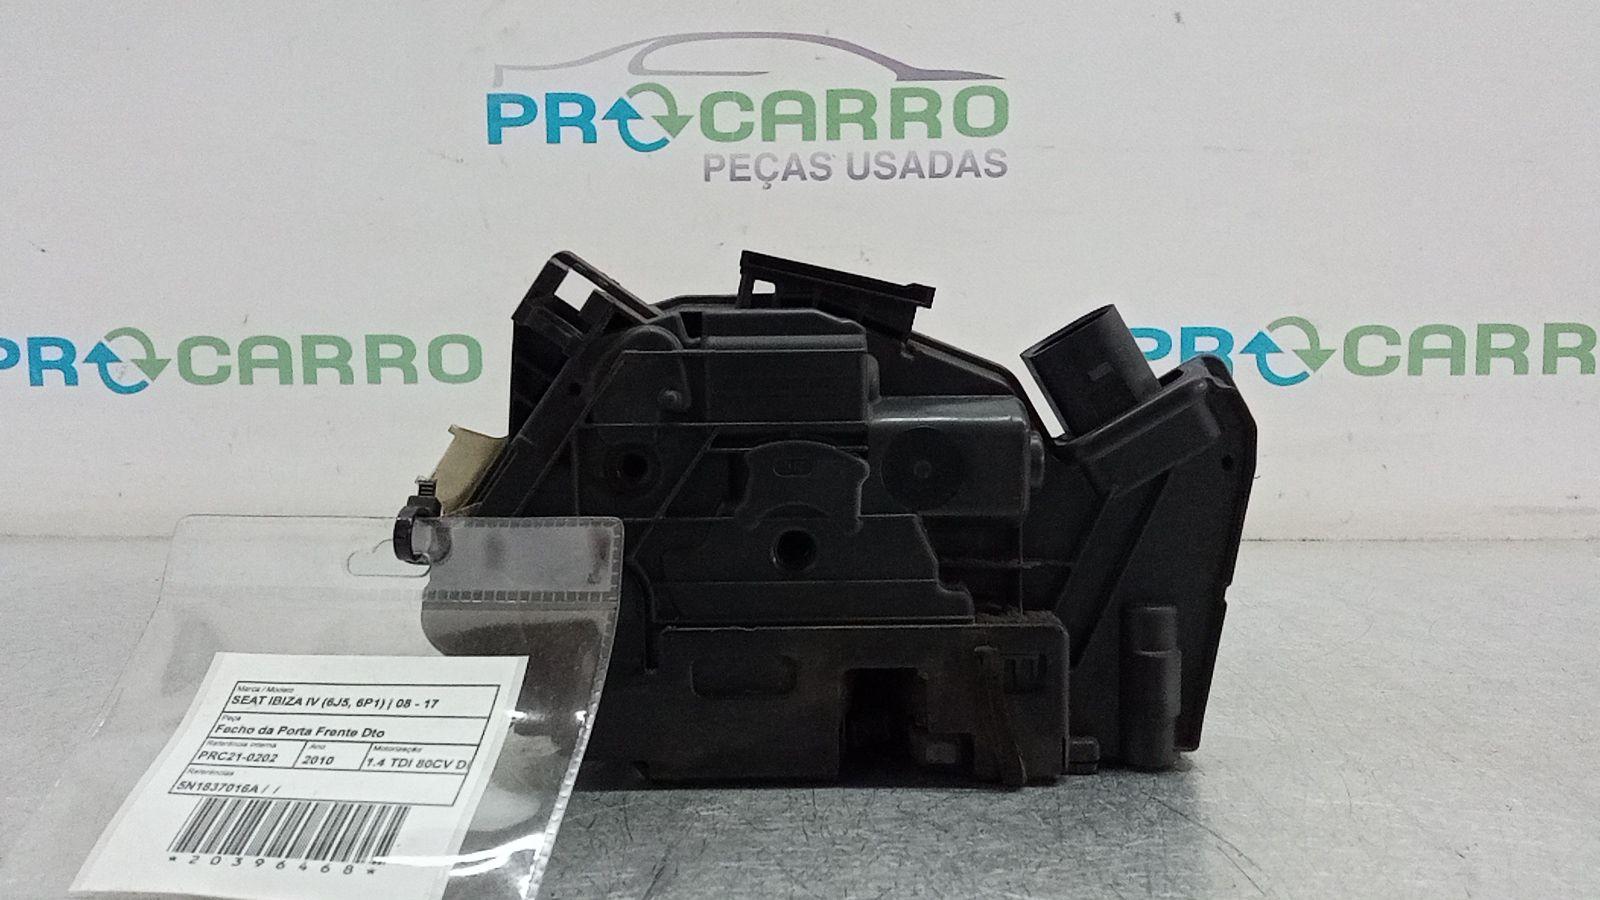 Fecho da Porta Frente Dto (20396468).